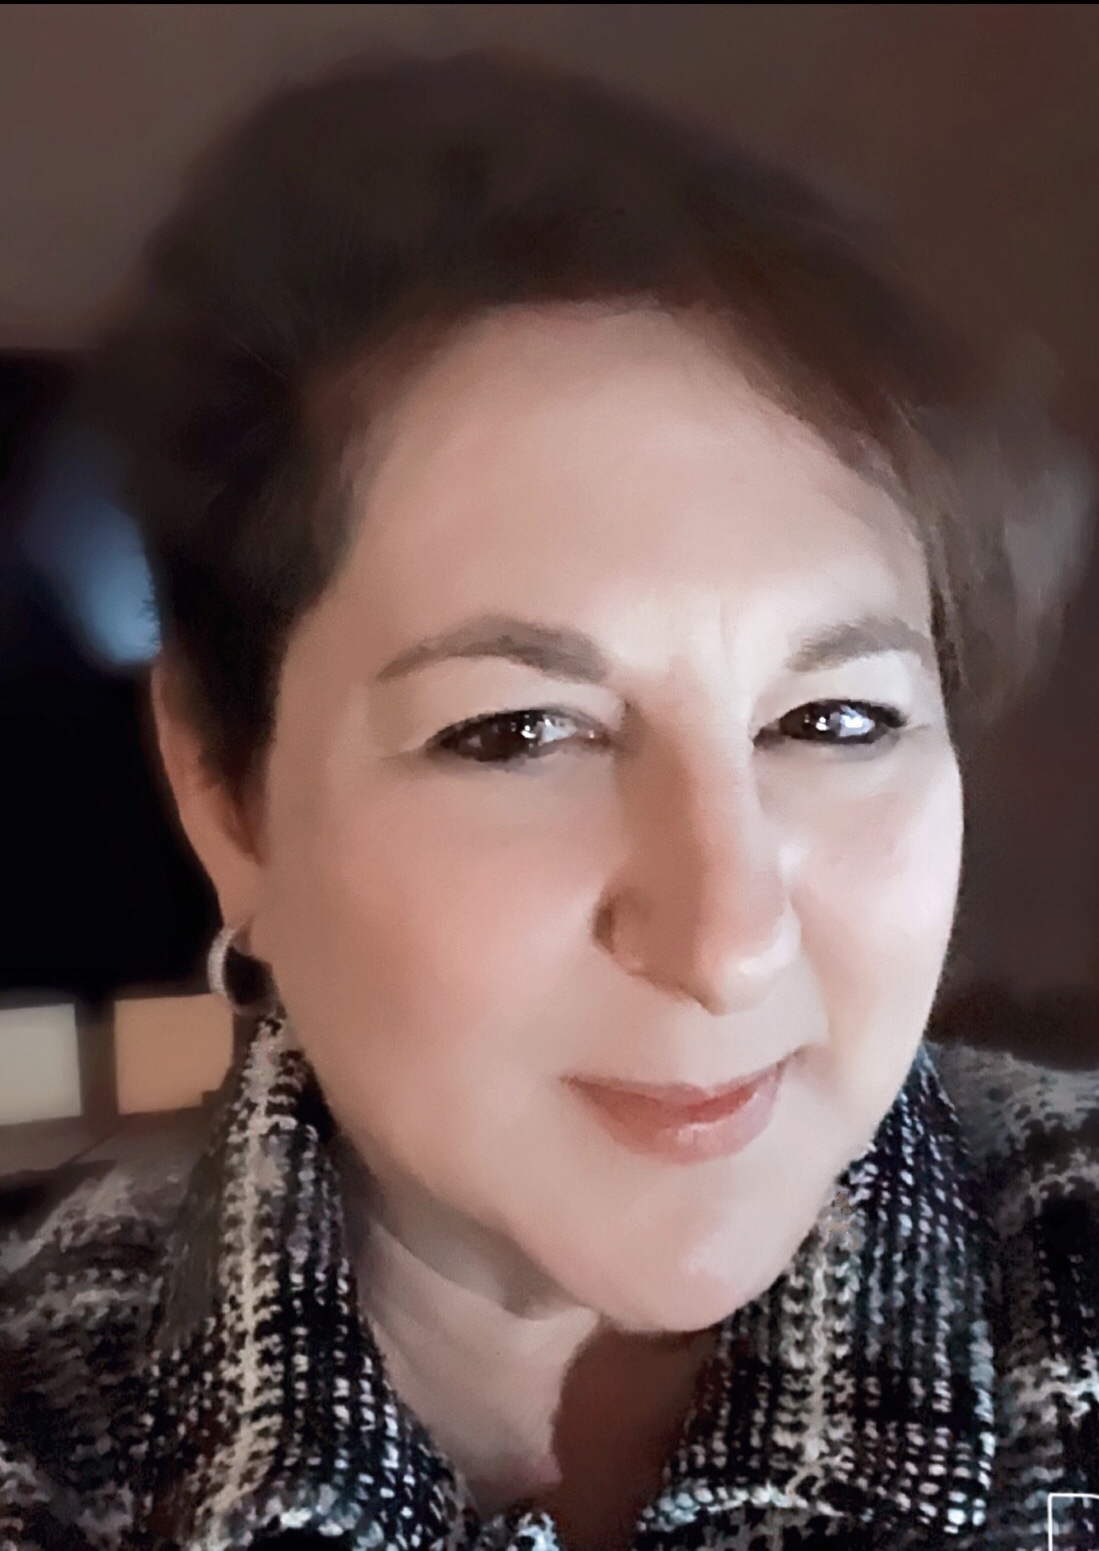 Linda Gordon MD, san francisco radiologist, radiologist in san francisco, BICRAD, BICRAD radiology